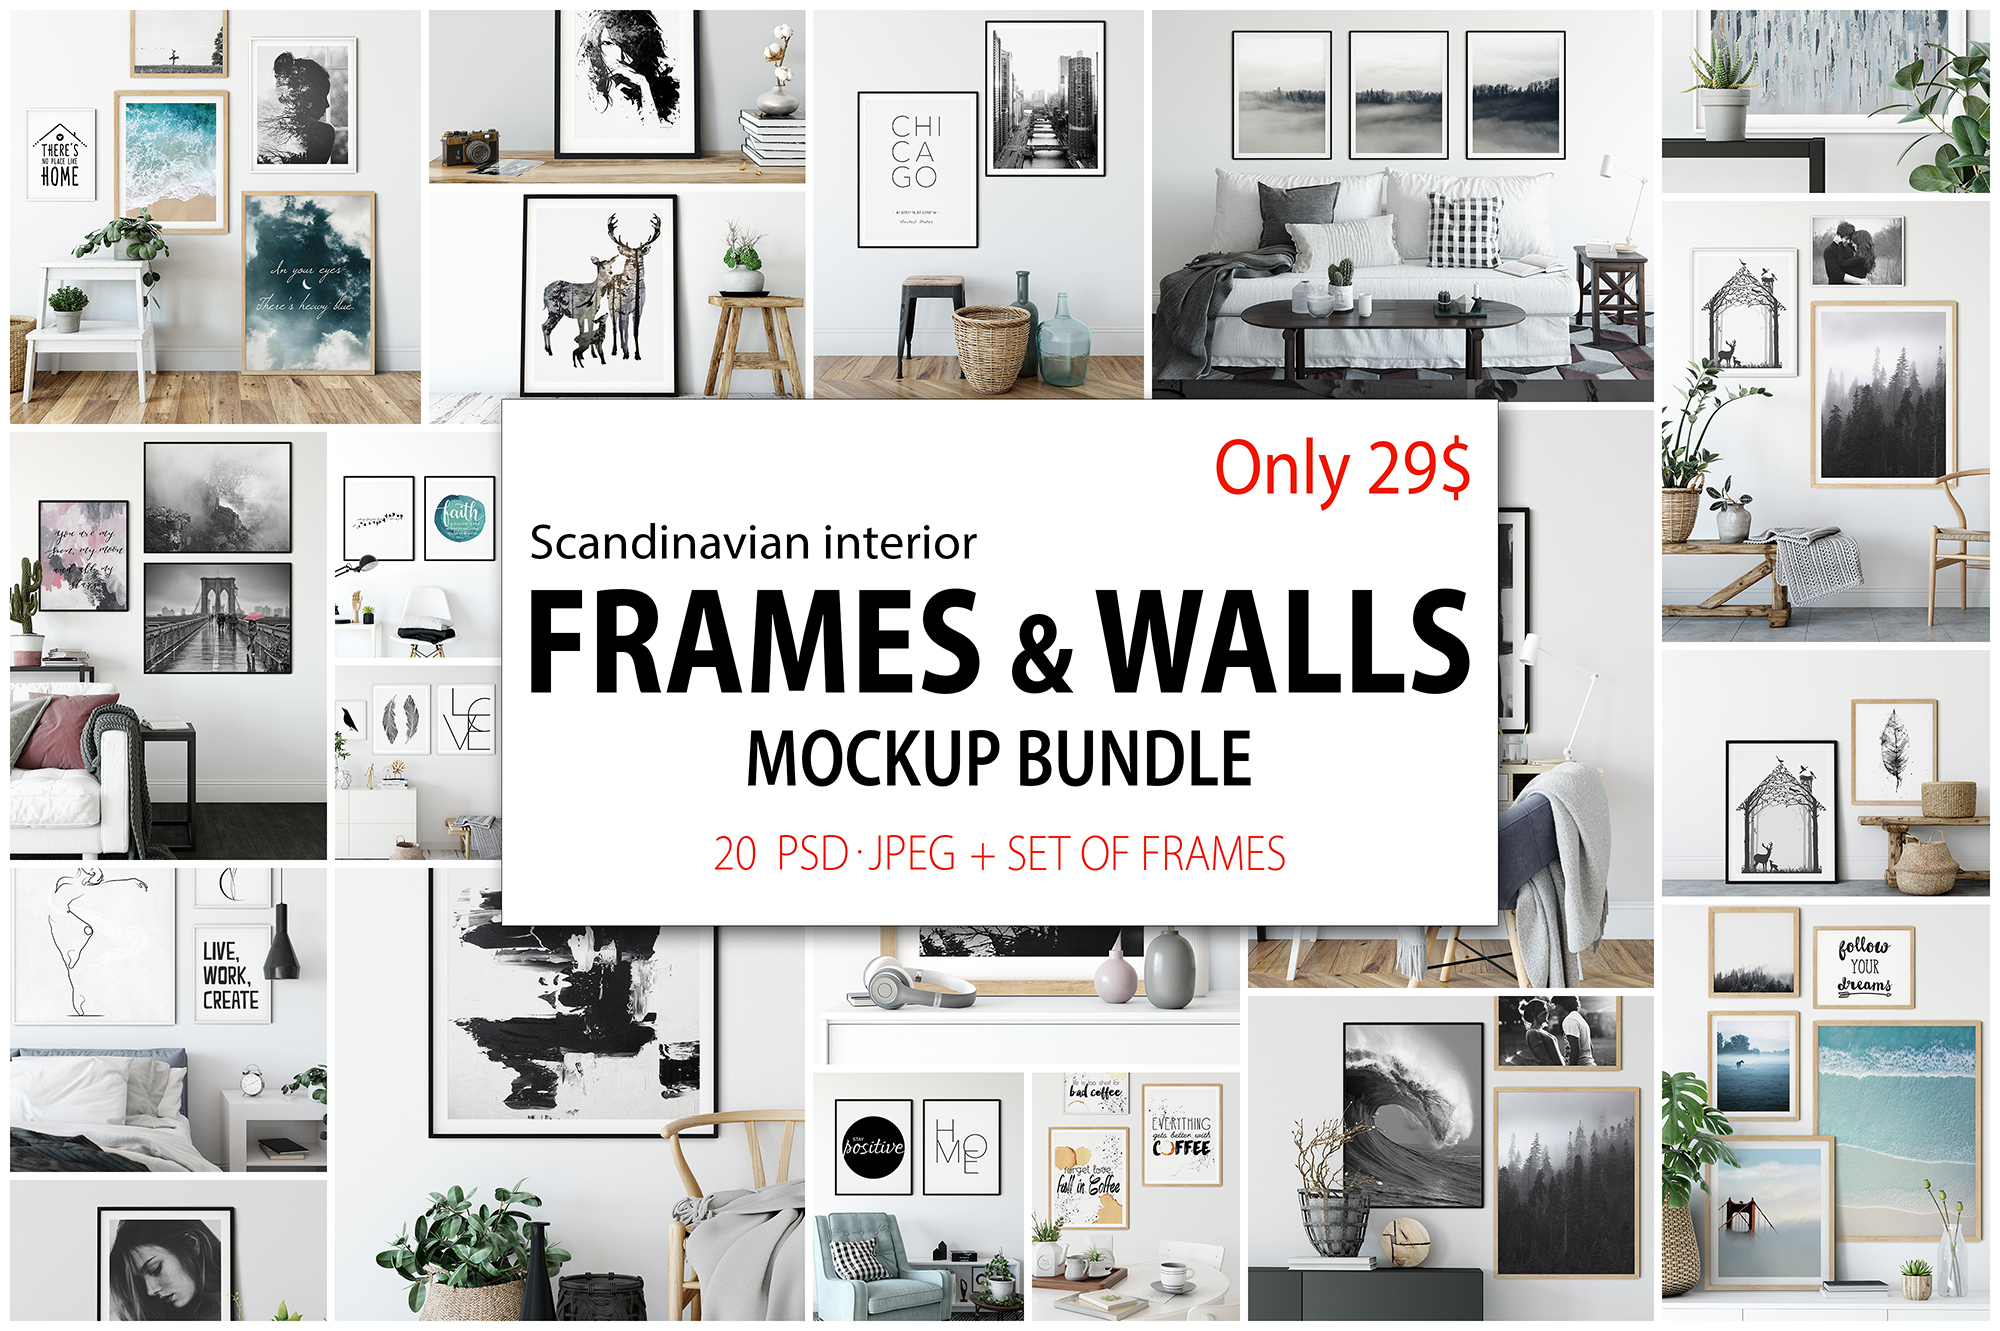 Scandinavian Interior Frames & Walls Mockup Bundle example image 1